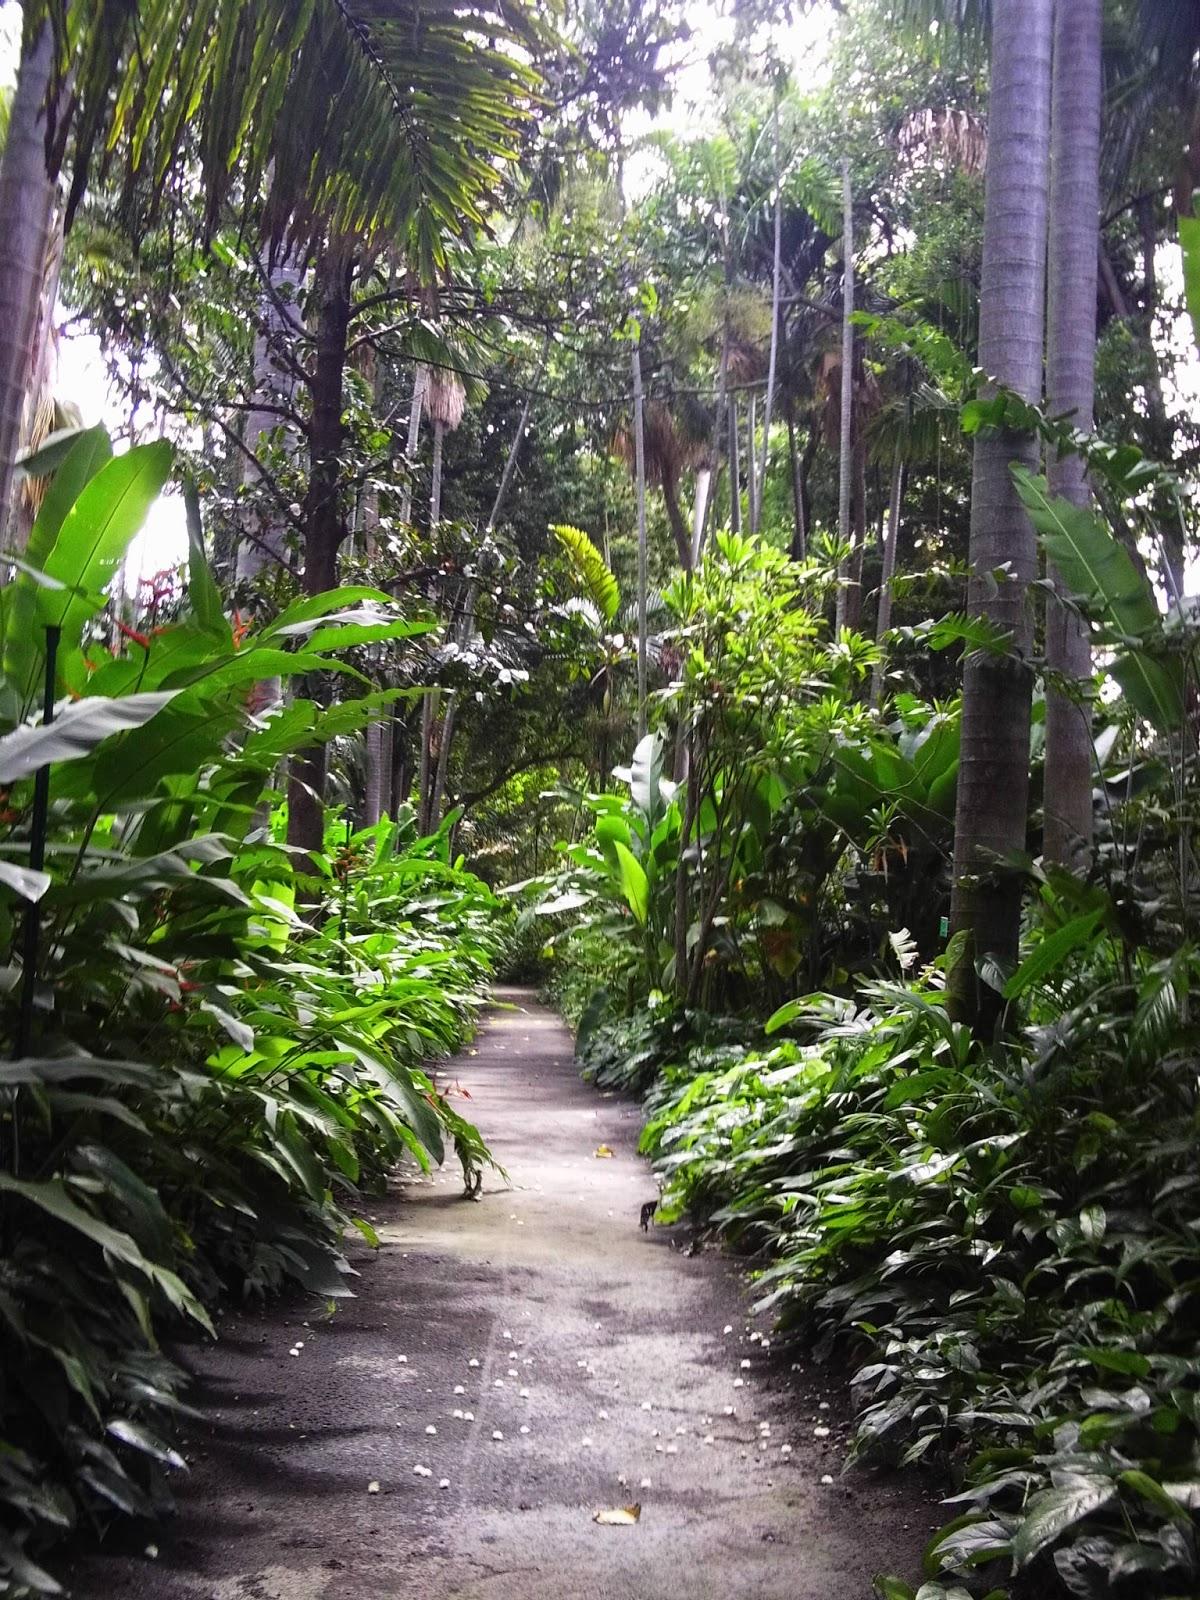 Over the rainbow foster botanical garden kuan yin temple for Foster botanical garden honolulu